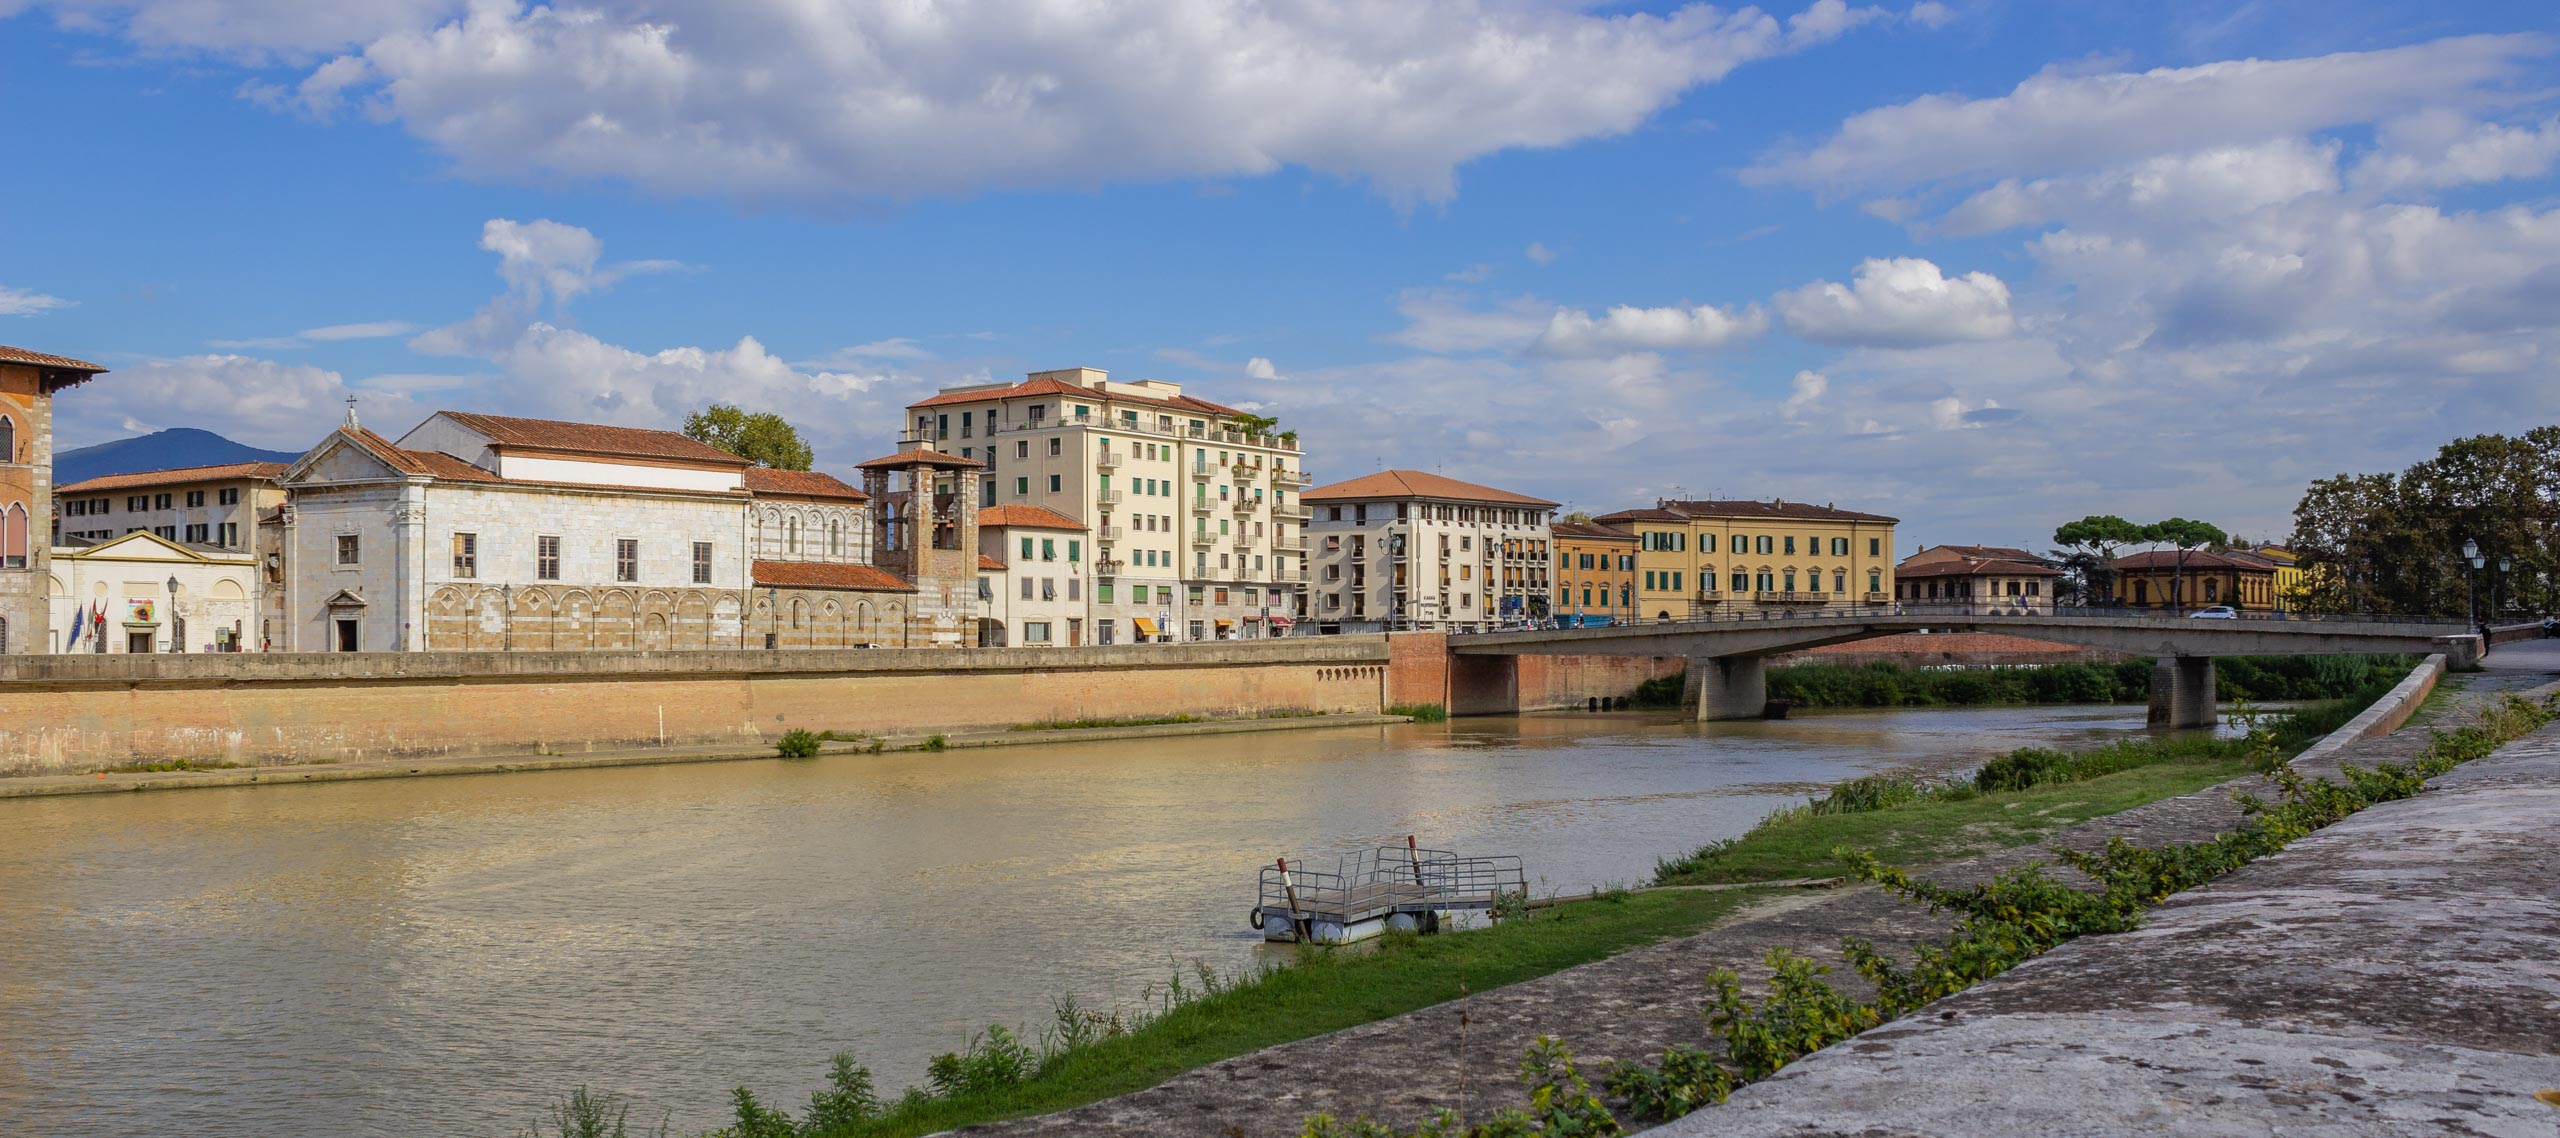 2013 10 Tuscany Pisa 001